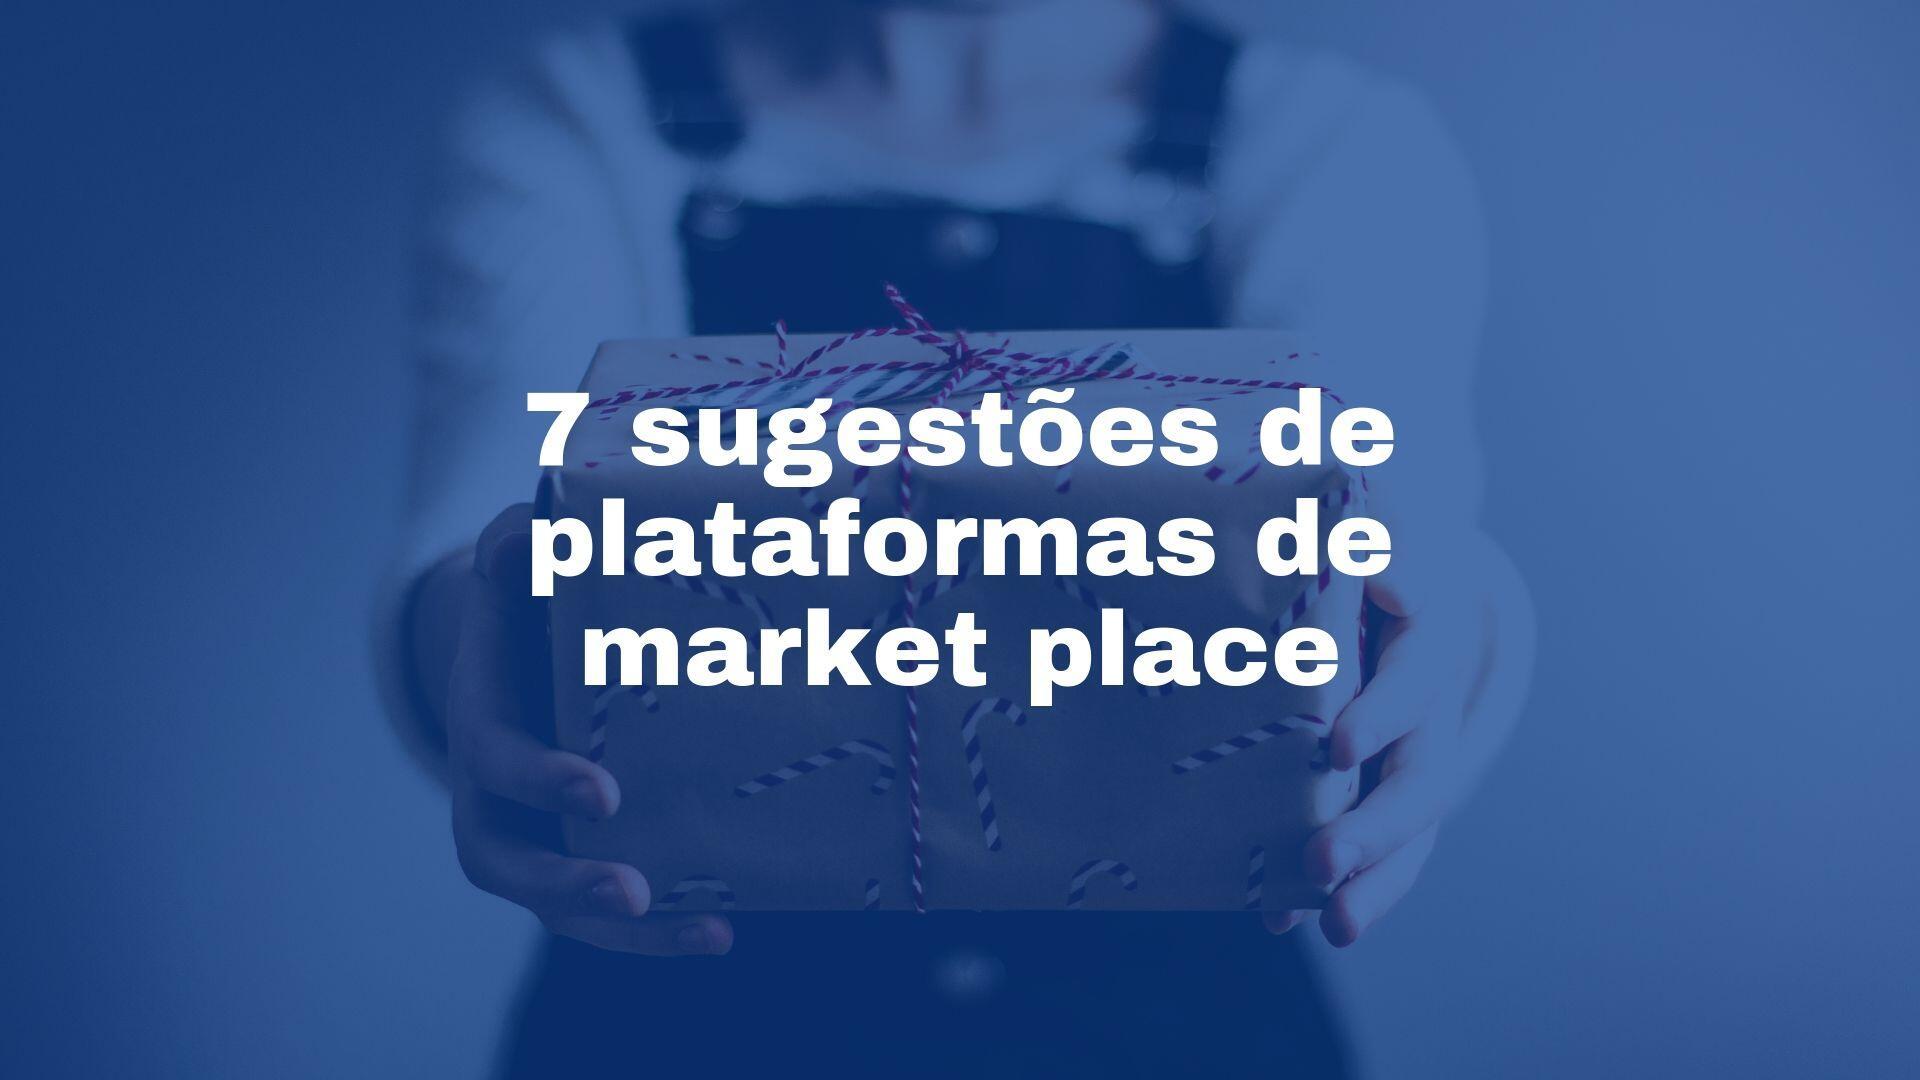 serviços contábeis ecommerce - sugestoes plataforma market place